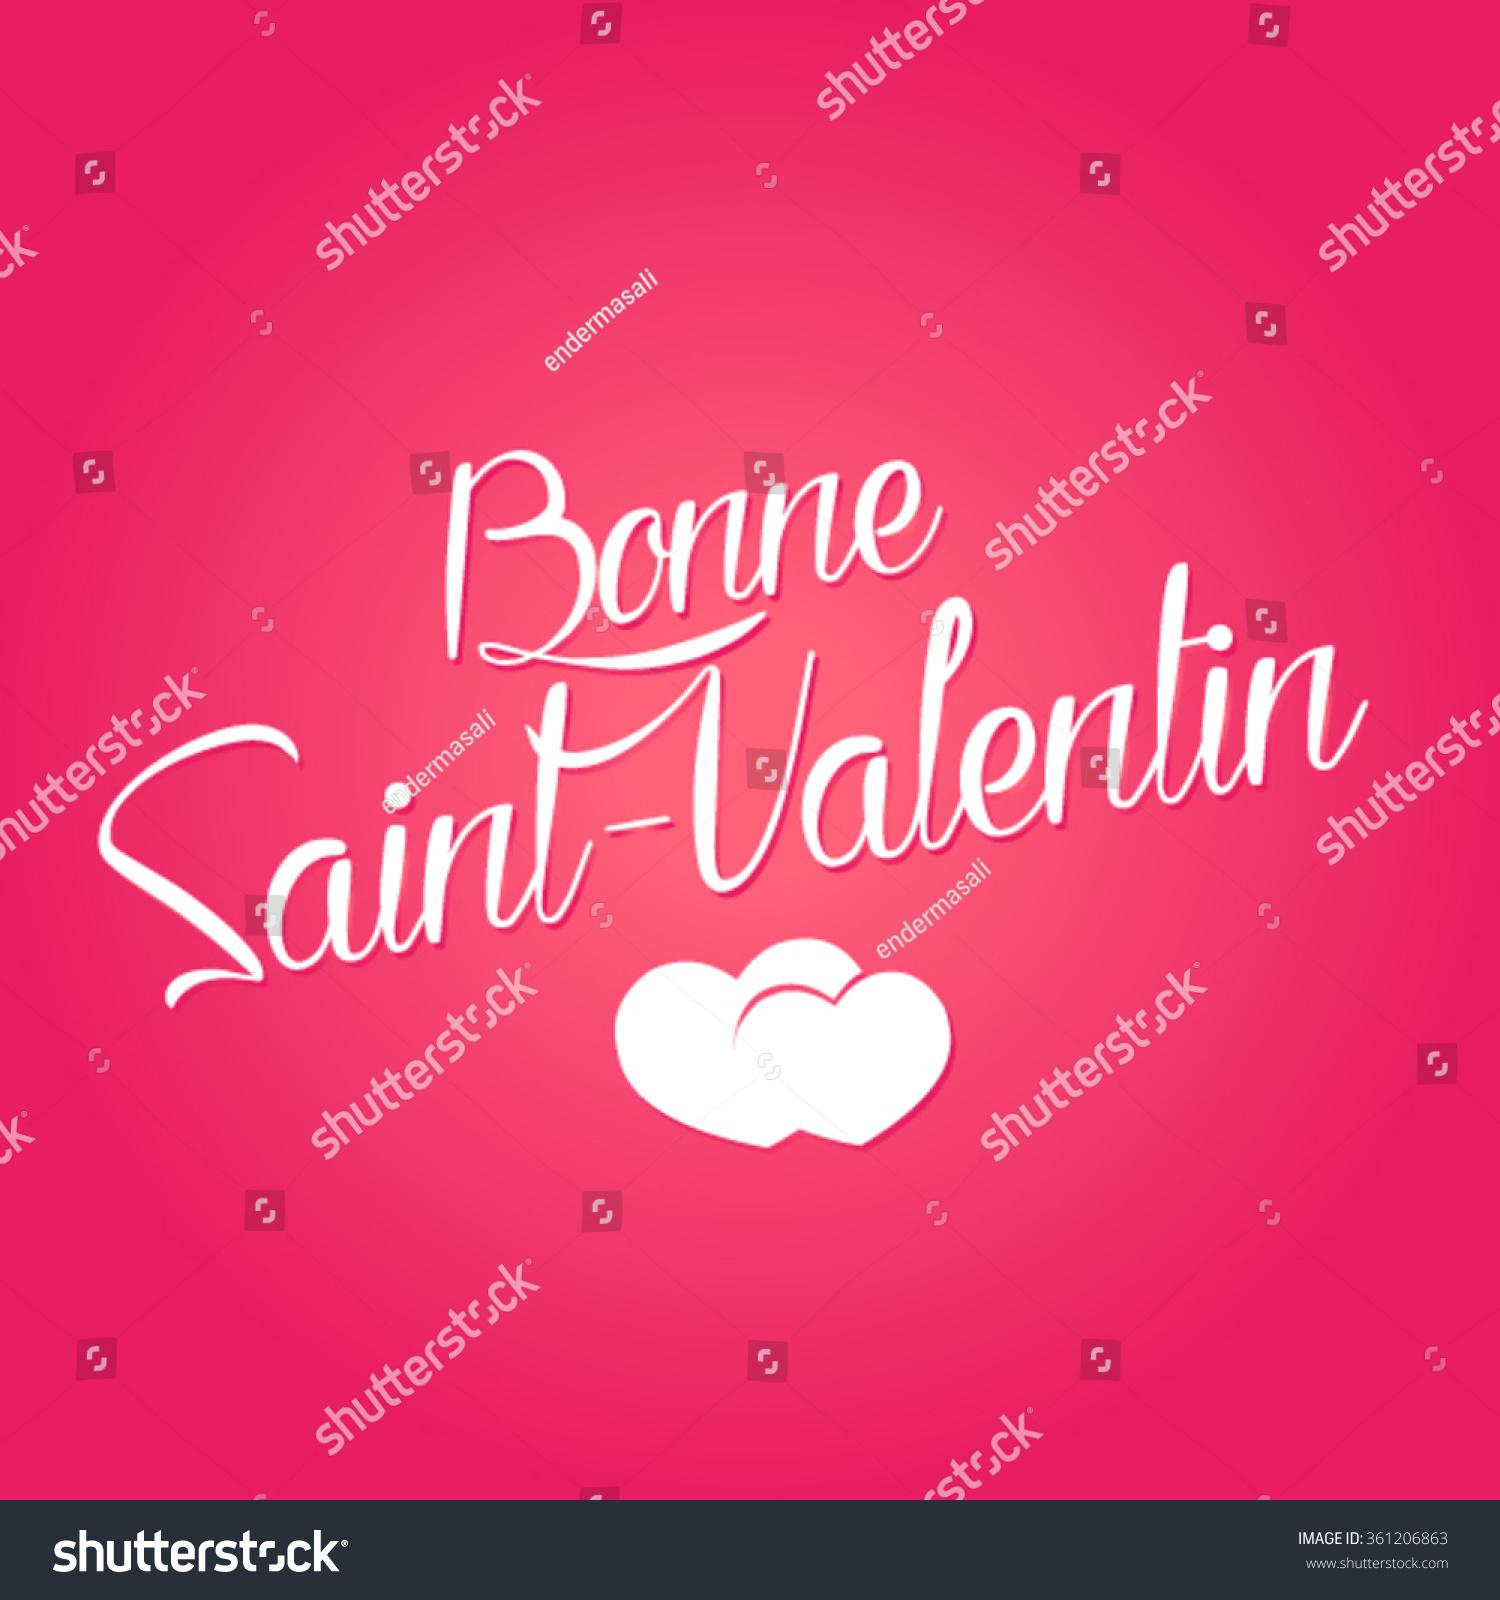 Happy Valentineu0027s Day 2016 Vector (French Speak: Bonne Saint Valentin)